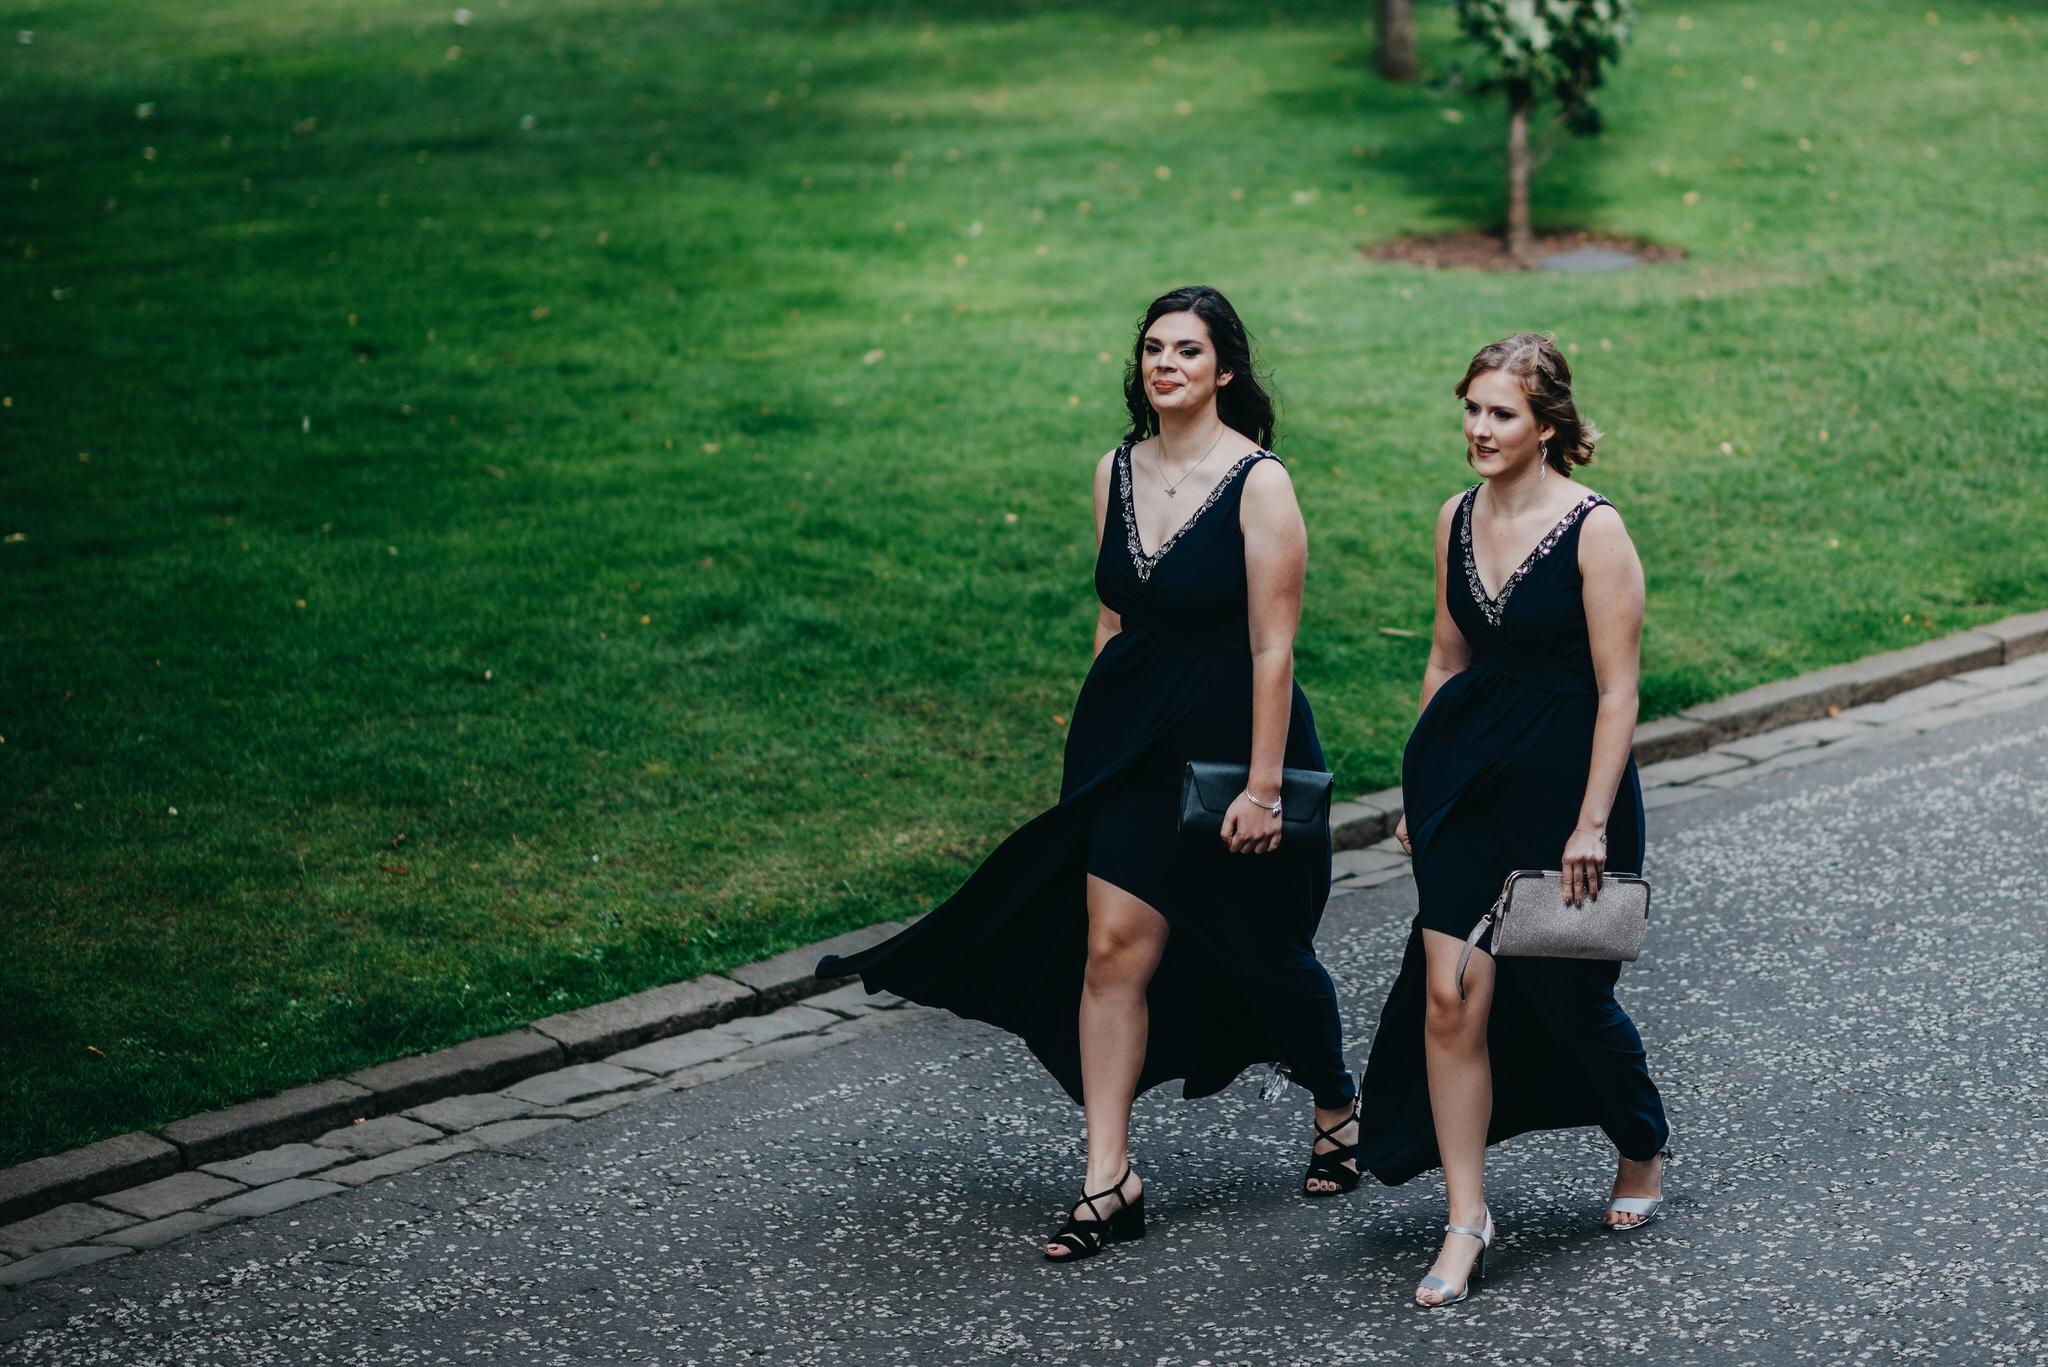 Courtney & Linards 281.jpg